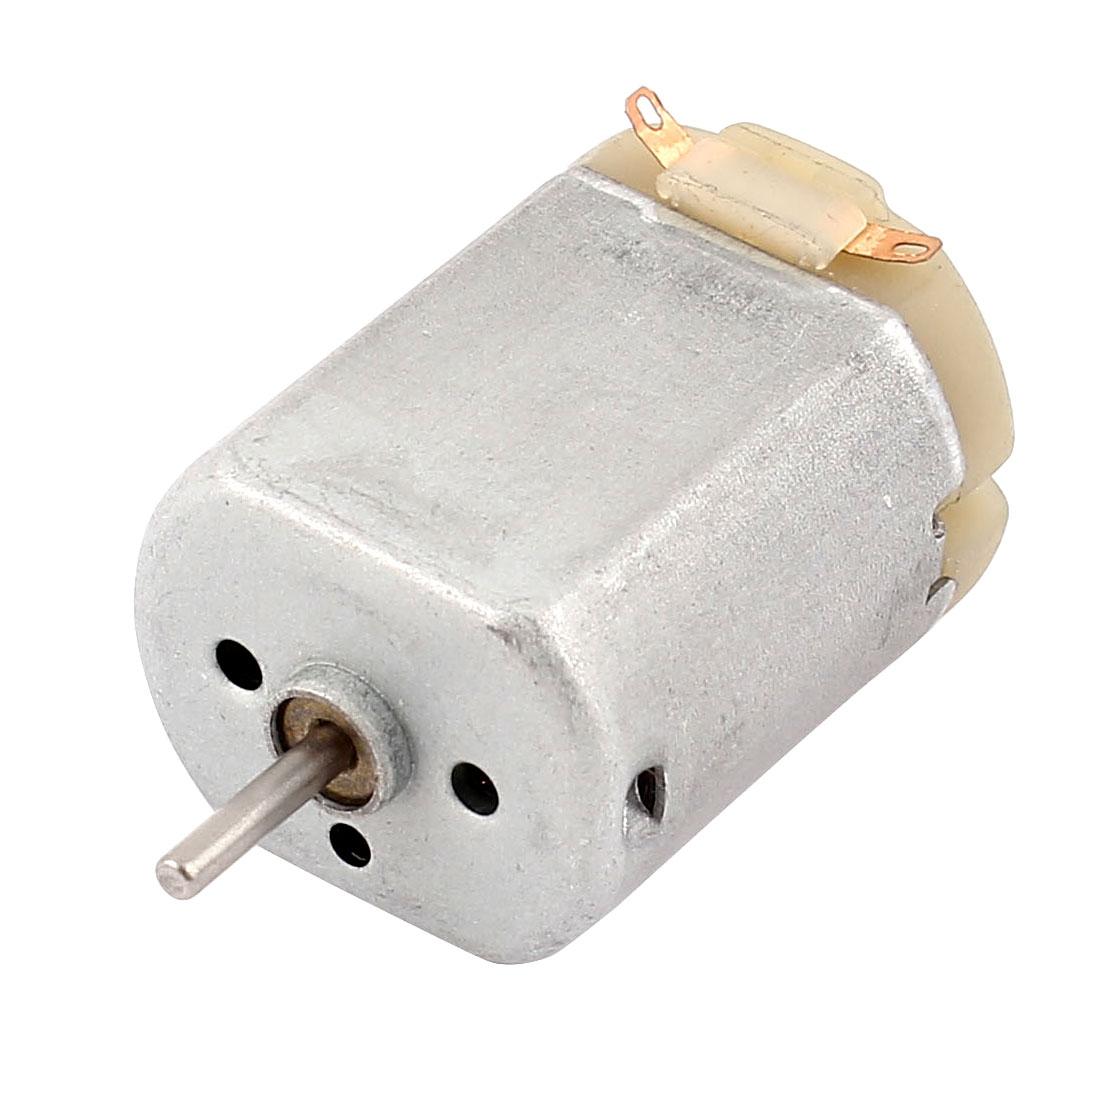 2mm Shaft DC 6-12V 11090RPM Electric Mini Motor for Cars DIY Toys